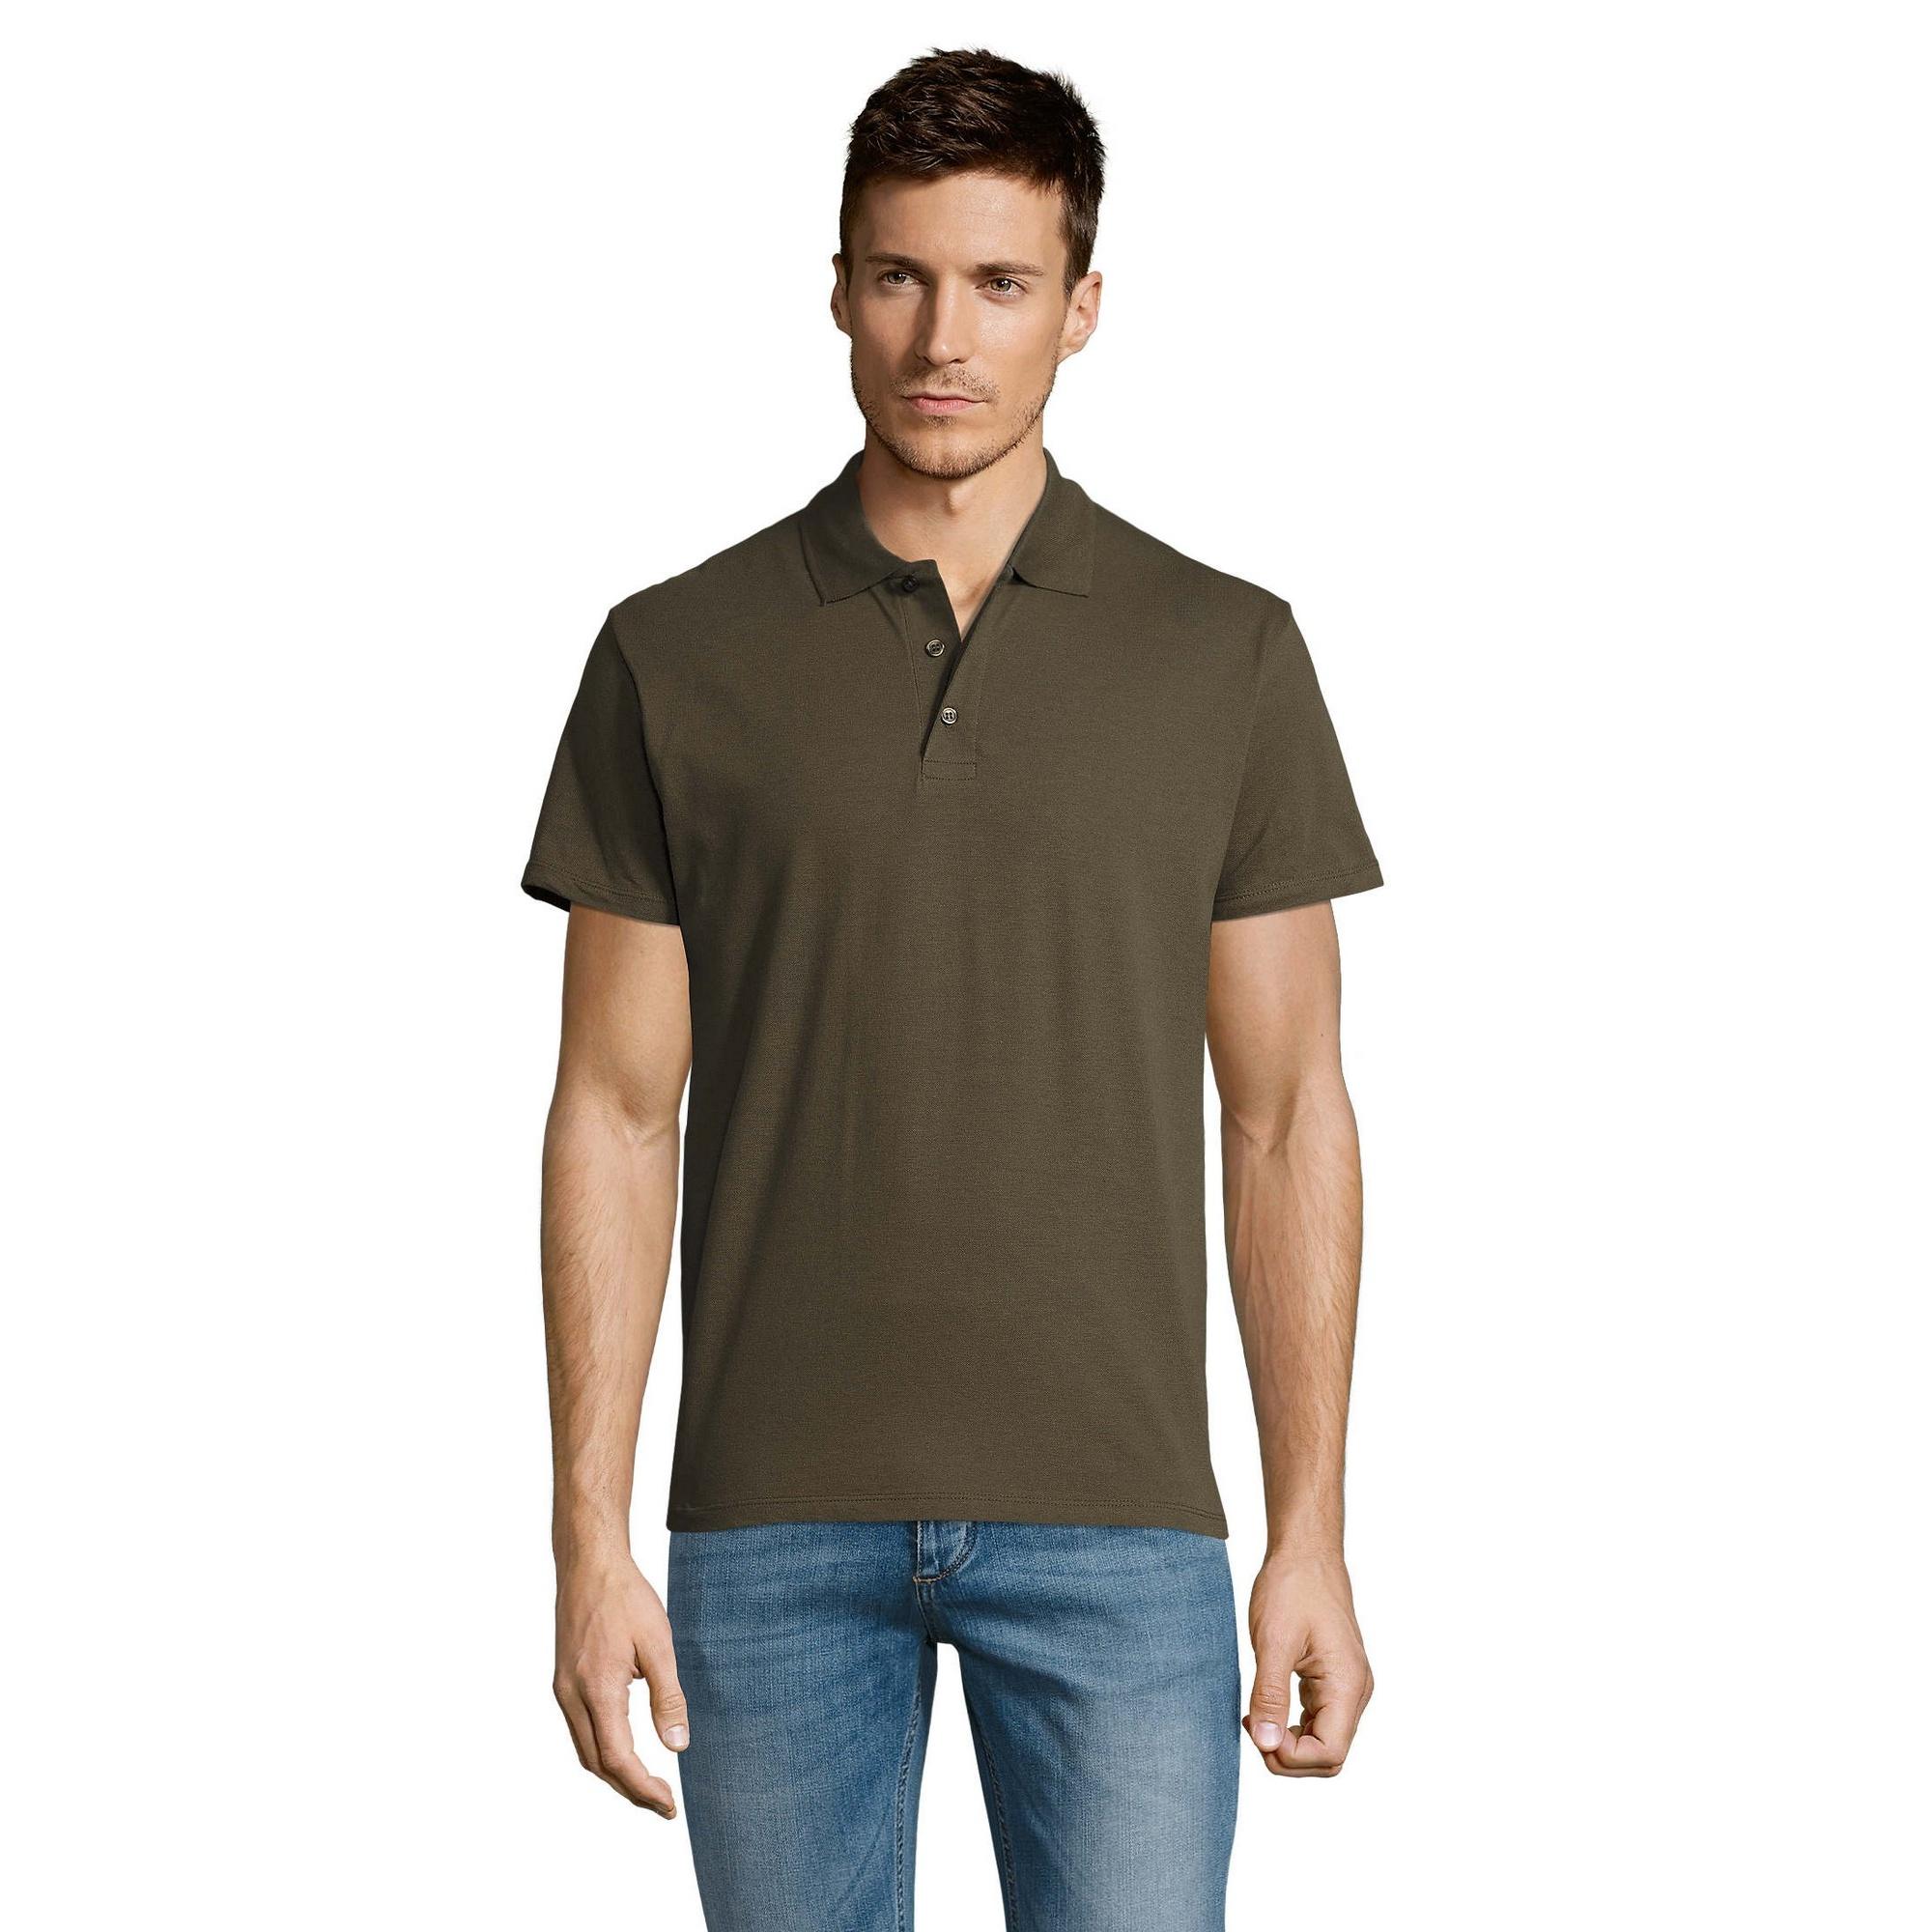 SOLS-Mens-Summer-II-Pique-Short-Sleeve-Casual-Plain-Polo-Shirt-T-Shirt-PC318 thumbnail 19